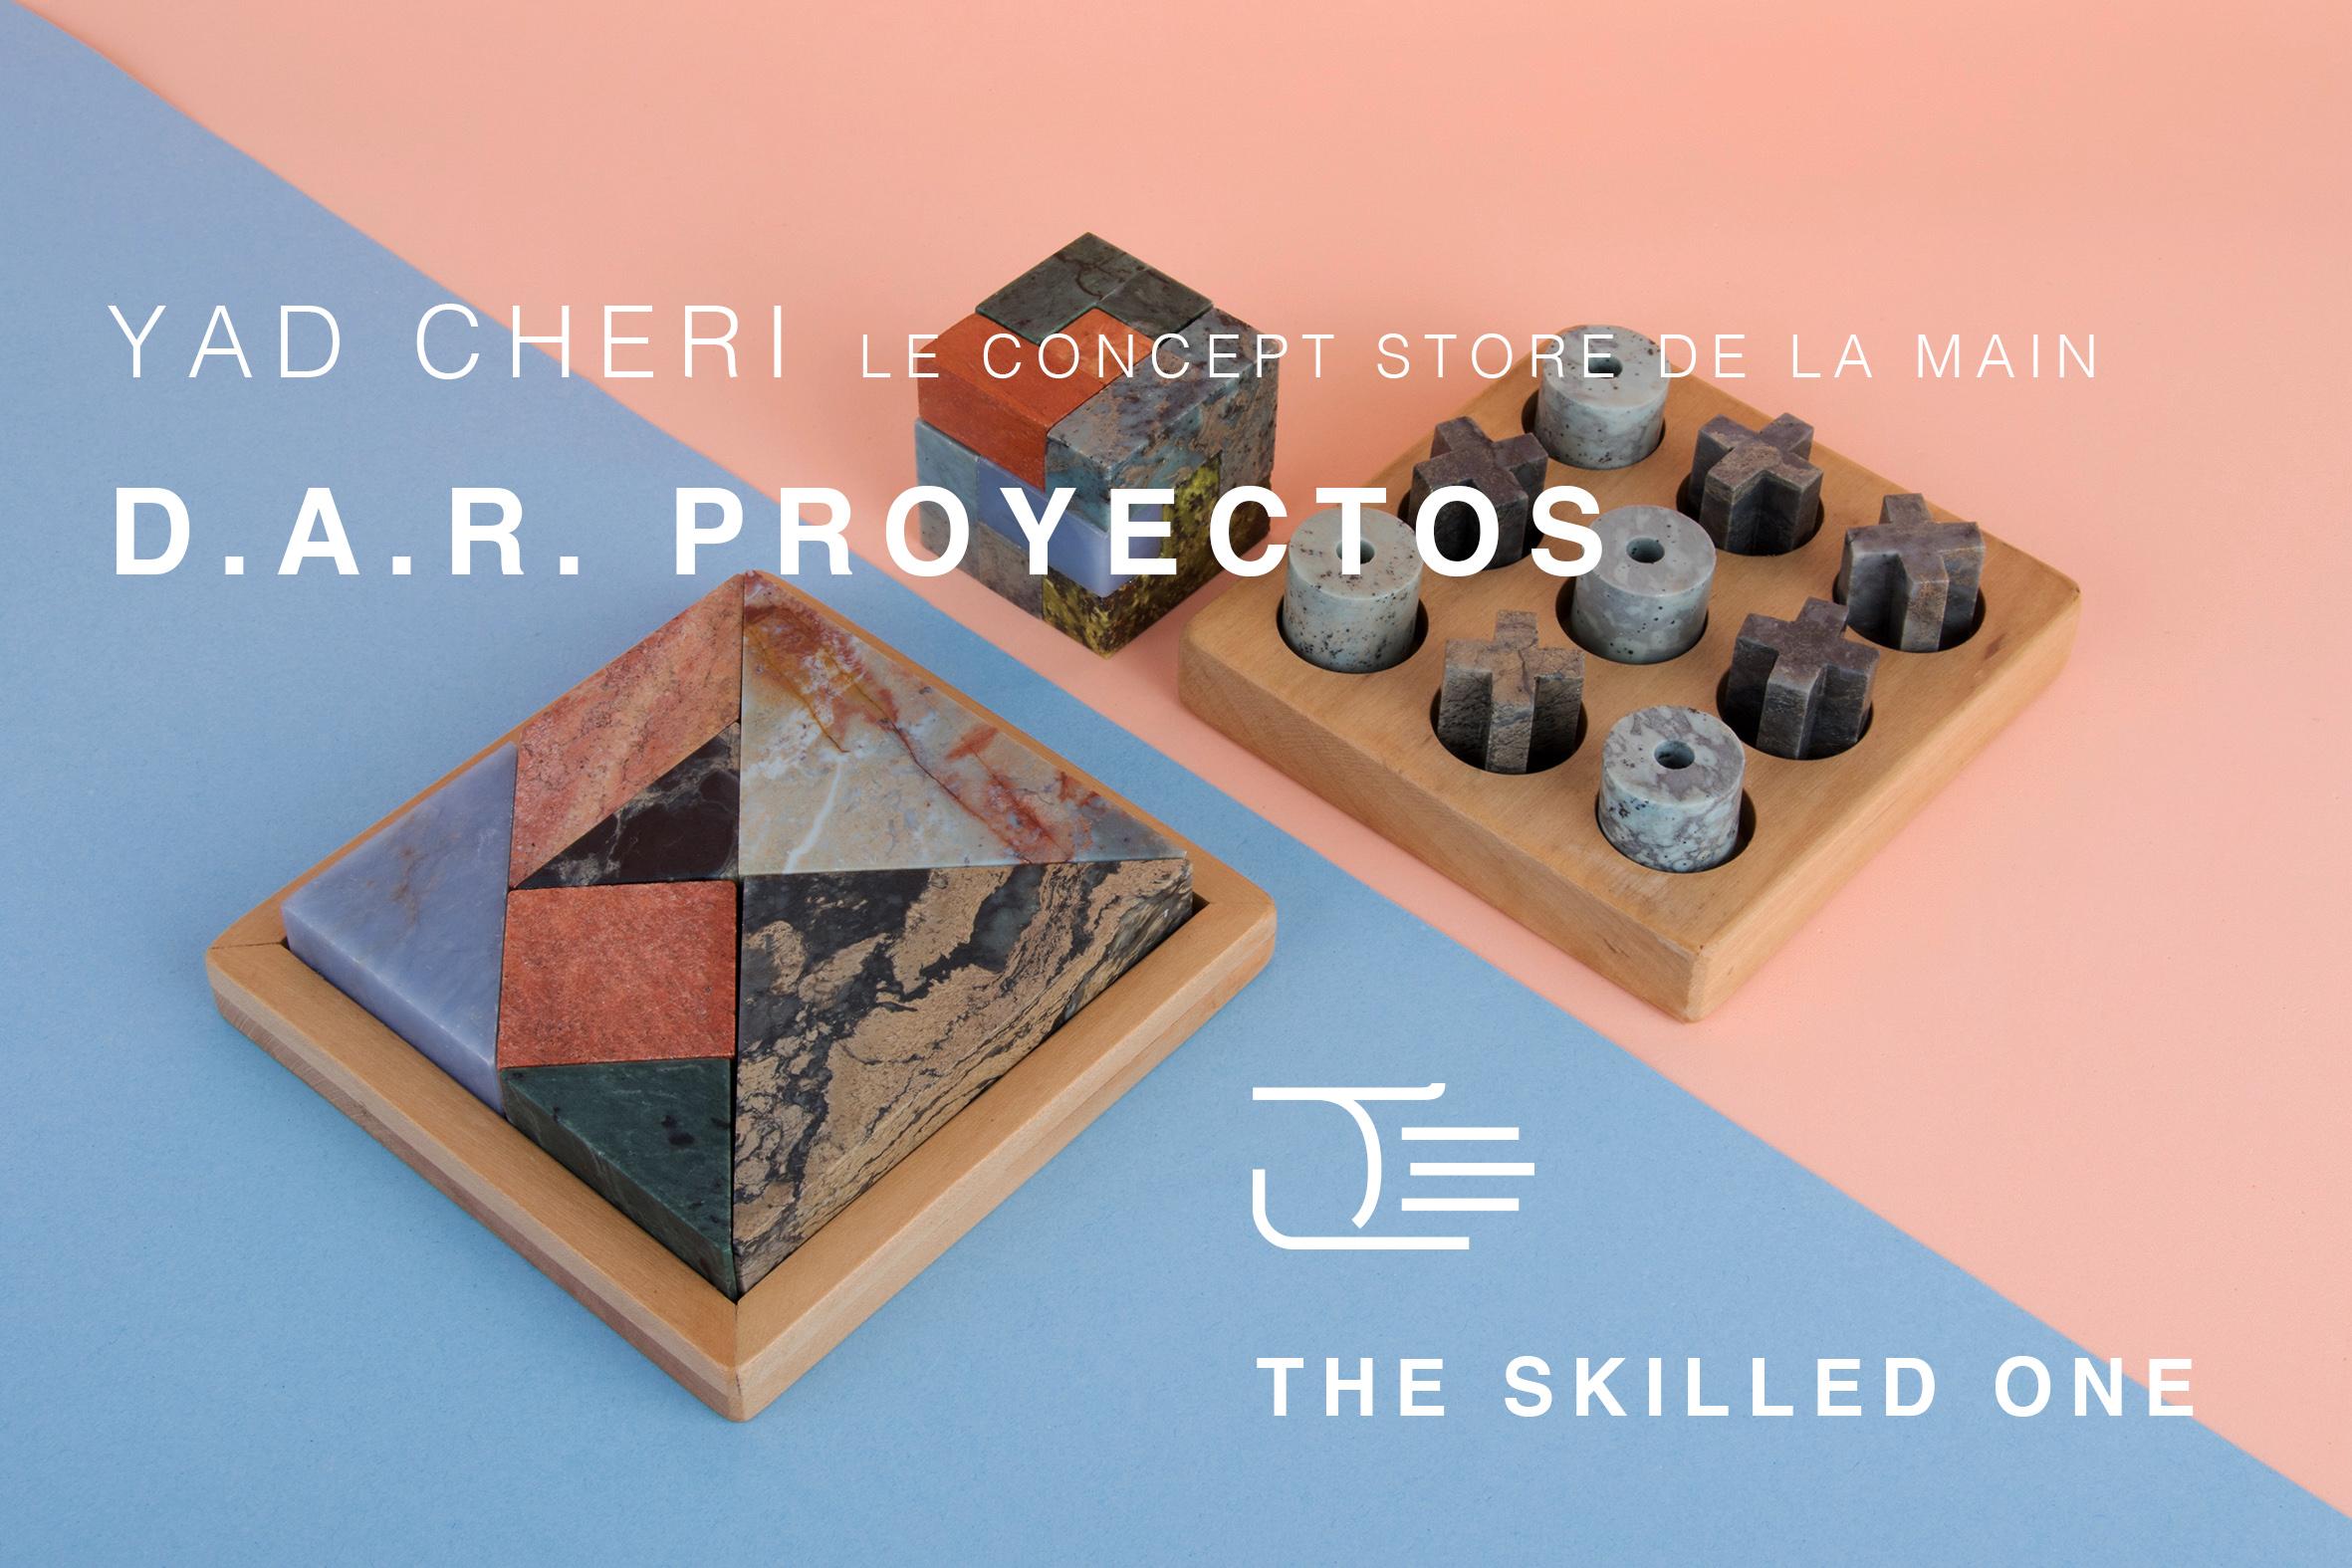 The_Skilled_One_DAR_Proyectos.jpg